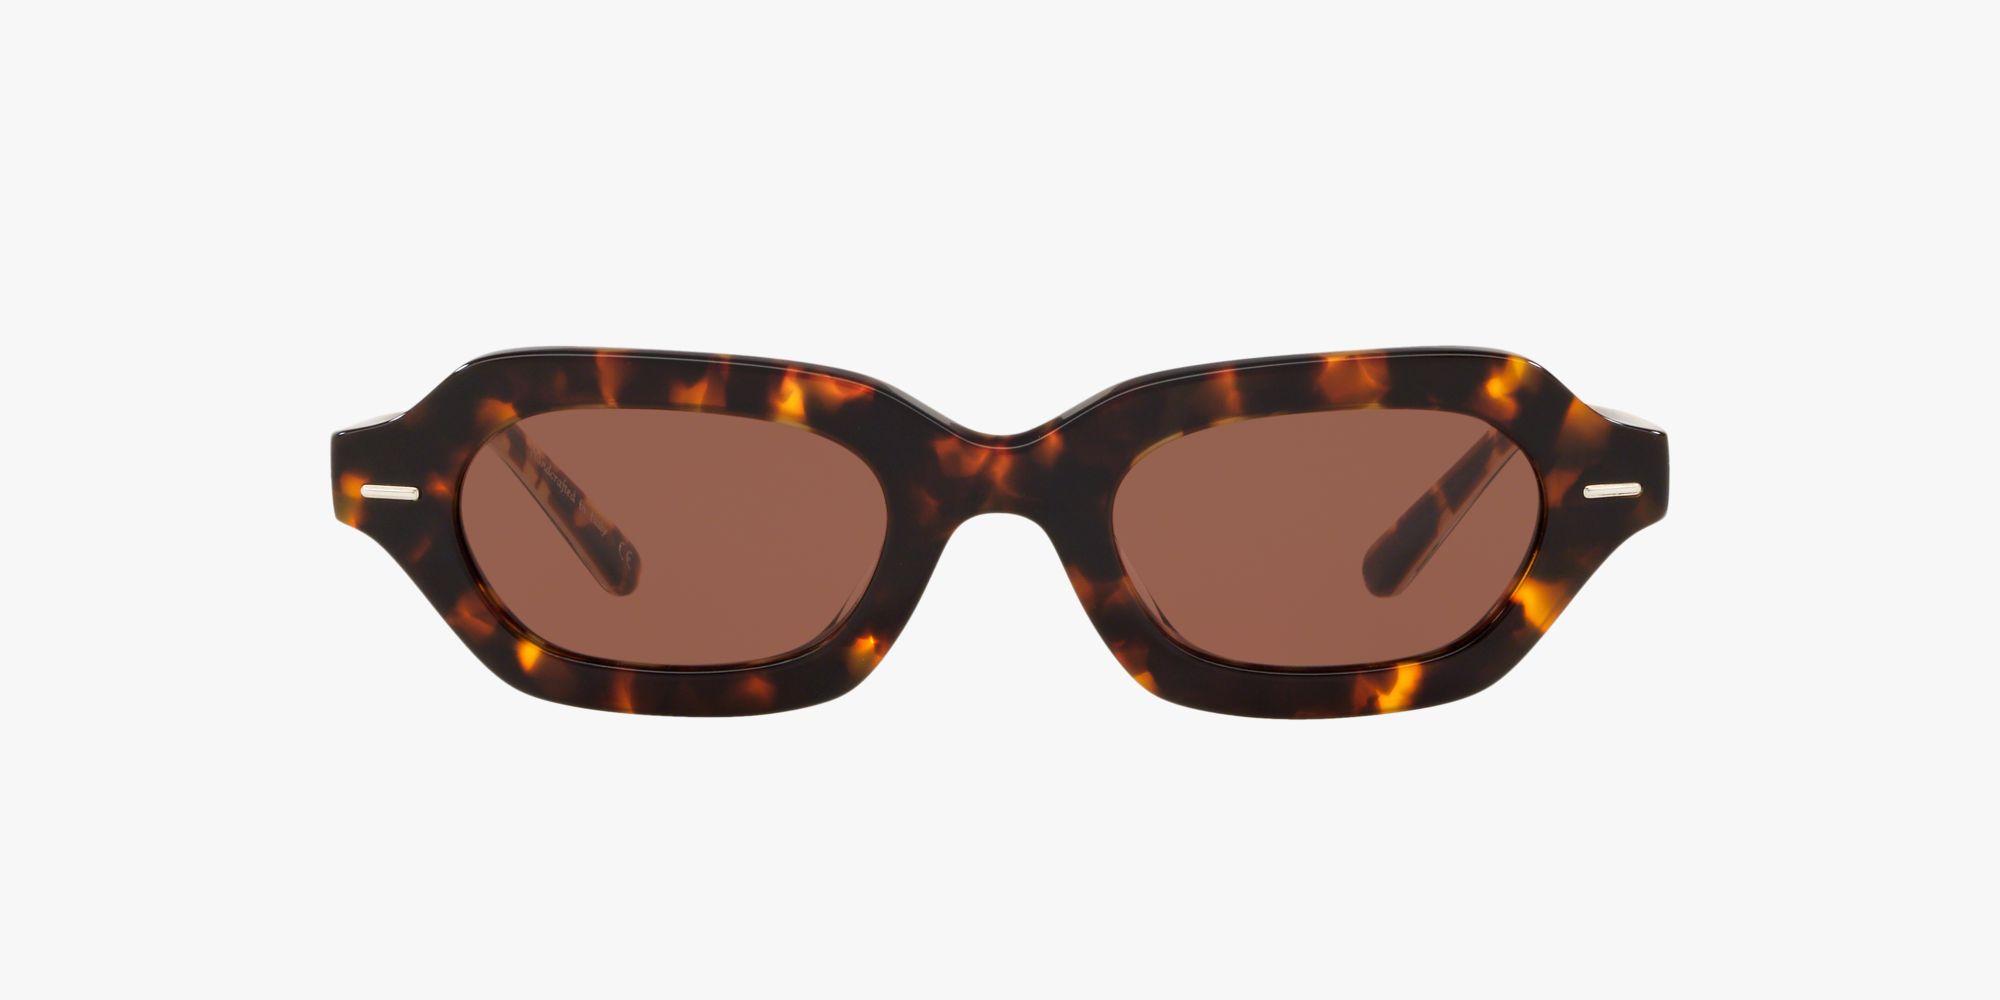 6f9839ad71 Sun OV5386SU - Whiskey Tortoise - Burgundy - Acetate